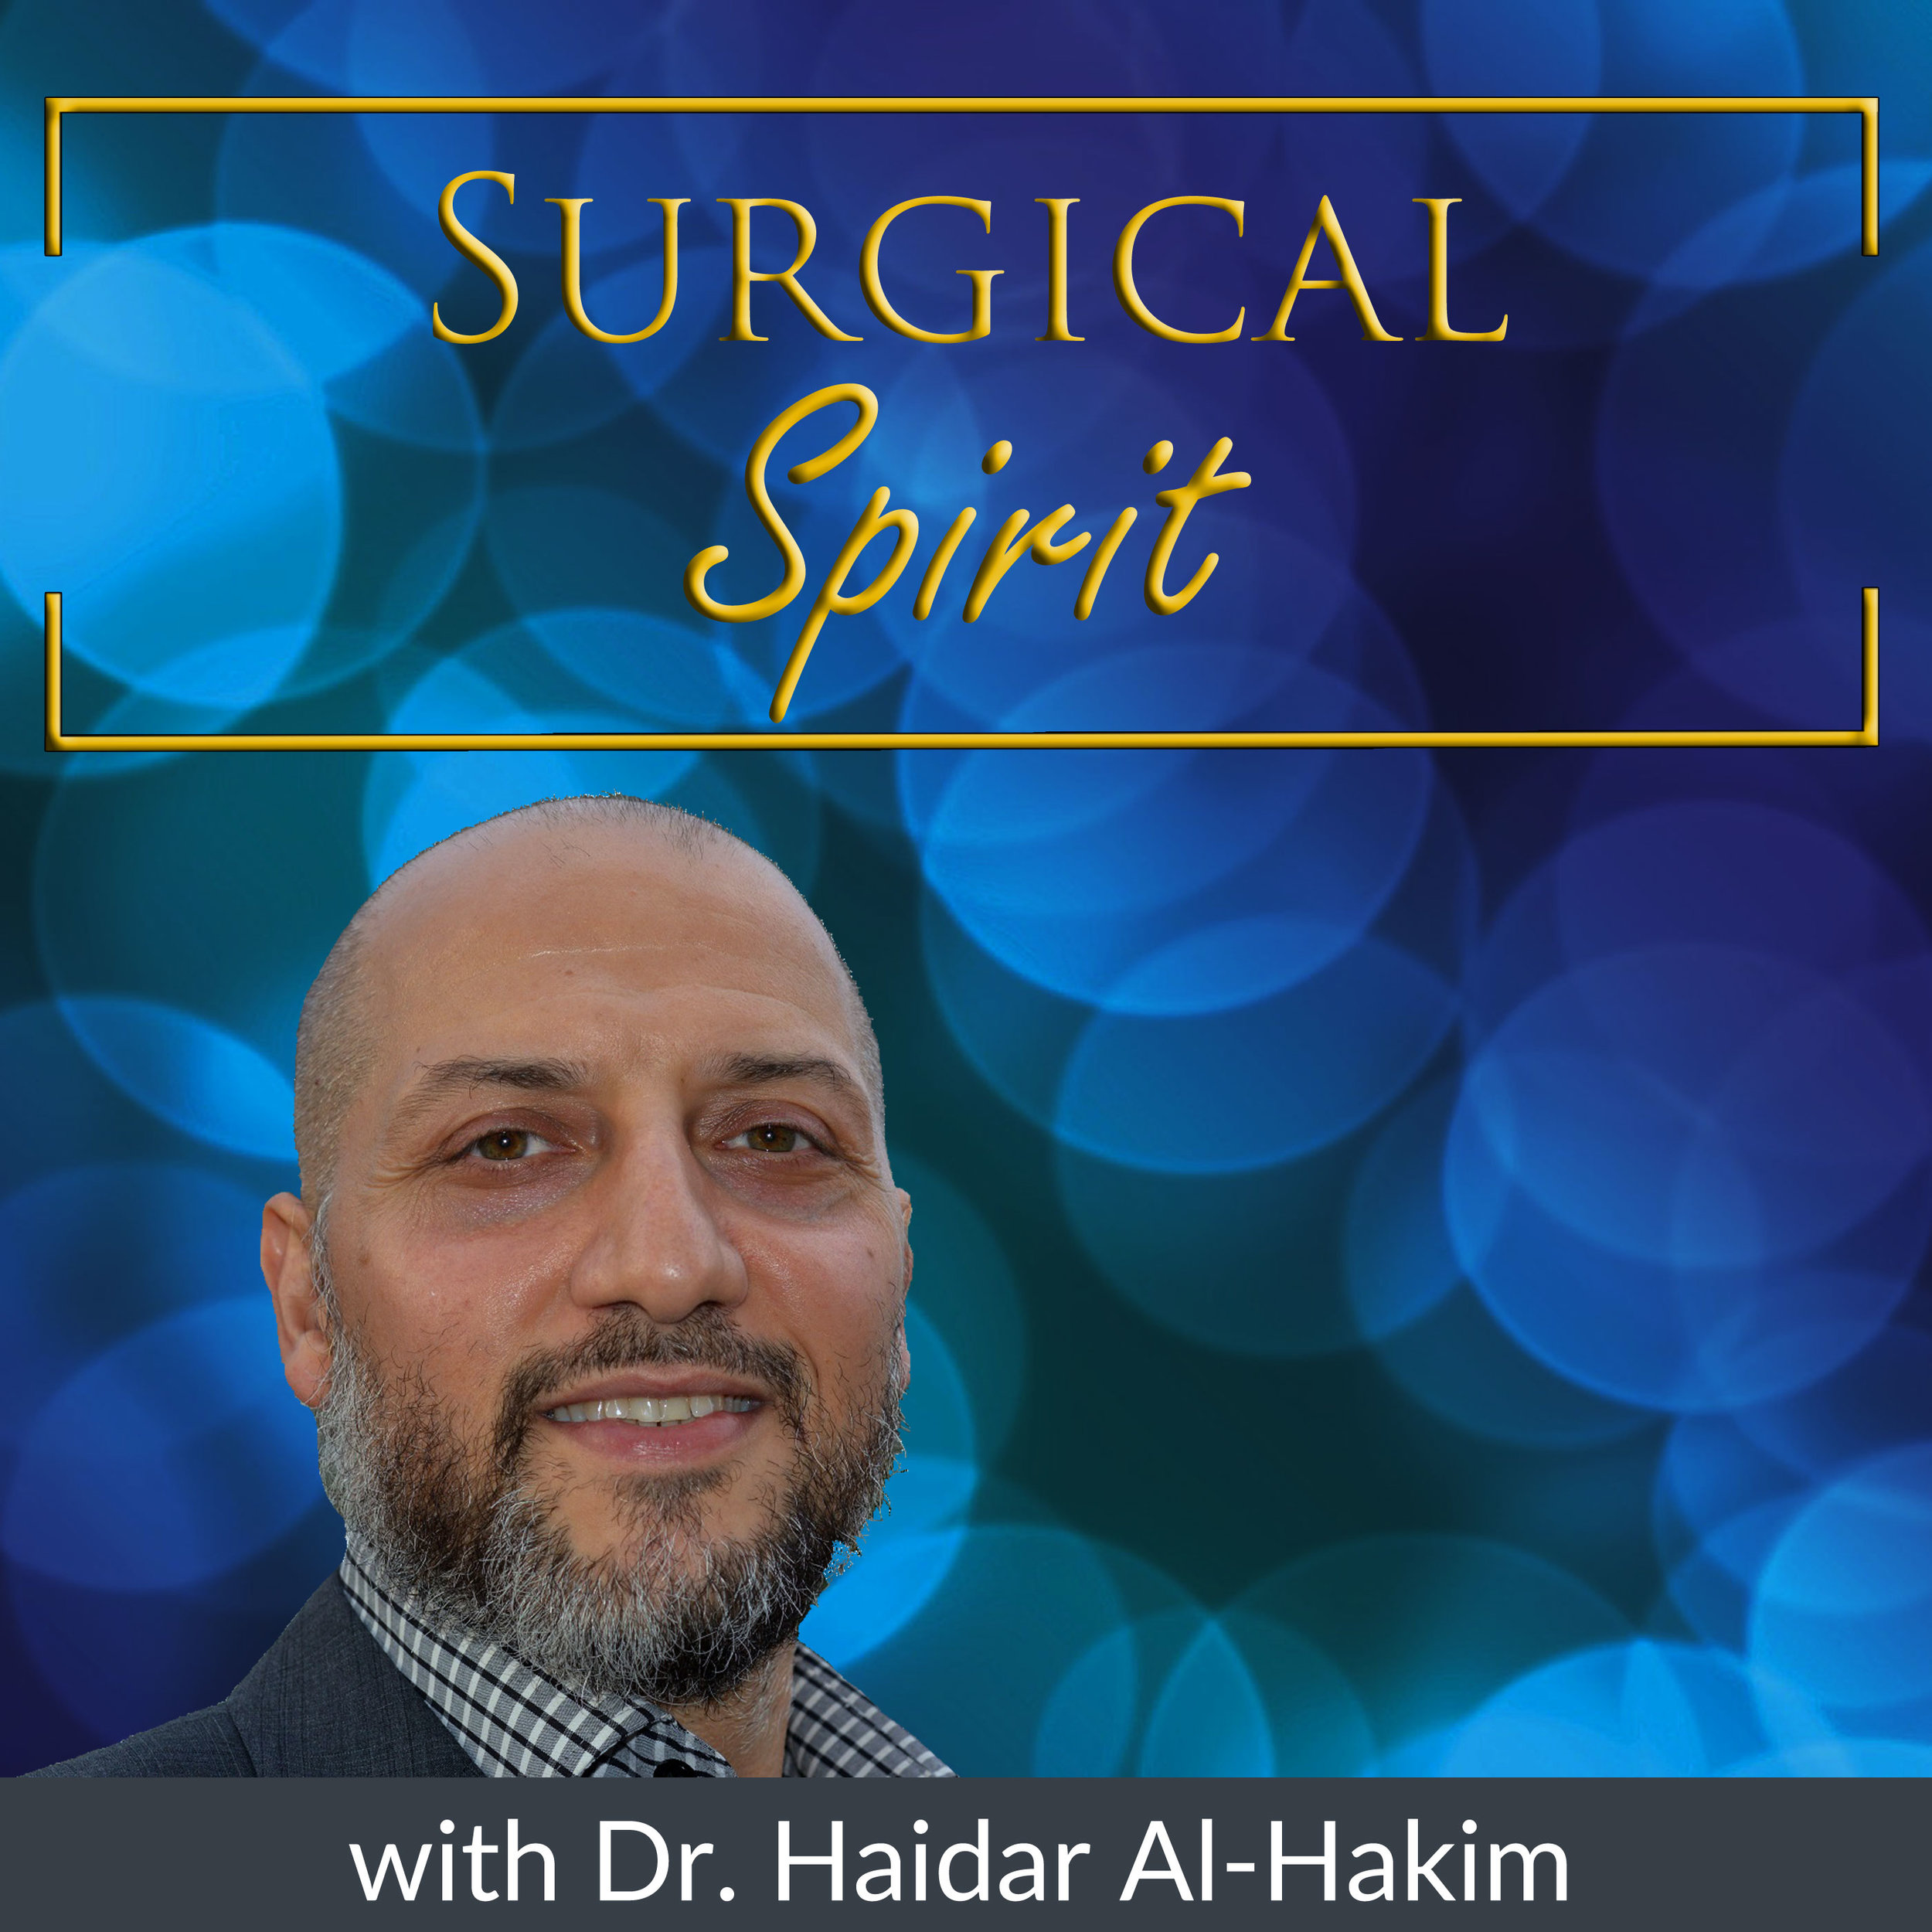 Surgical-Spirit-Podcast-Cover-2800-Sq.jpg